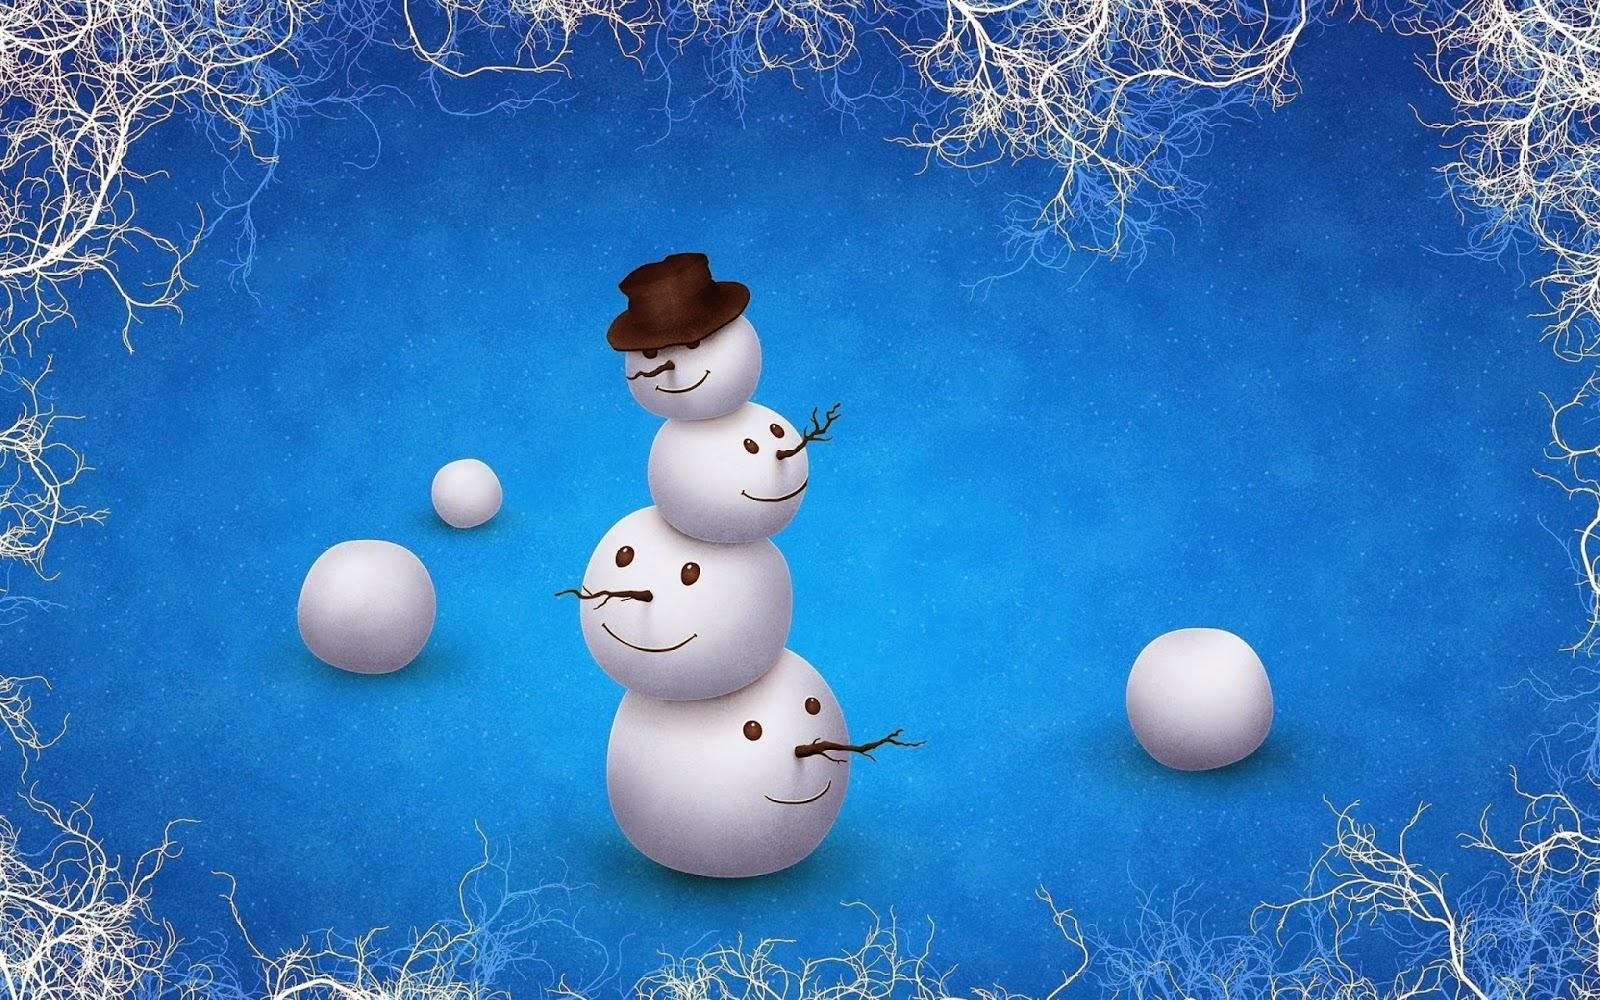 Free Christmas Wallpapers Downloads Best Hd Desktop: Ravishment: Merry Christmas Snowman Greetings And